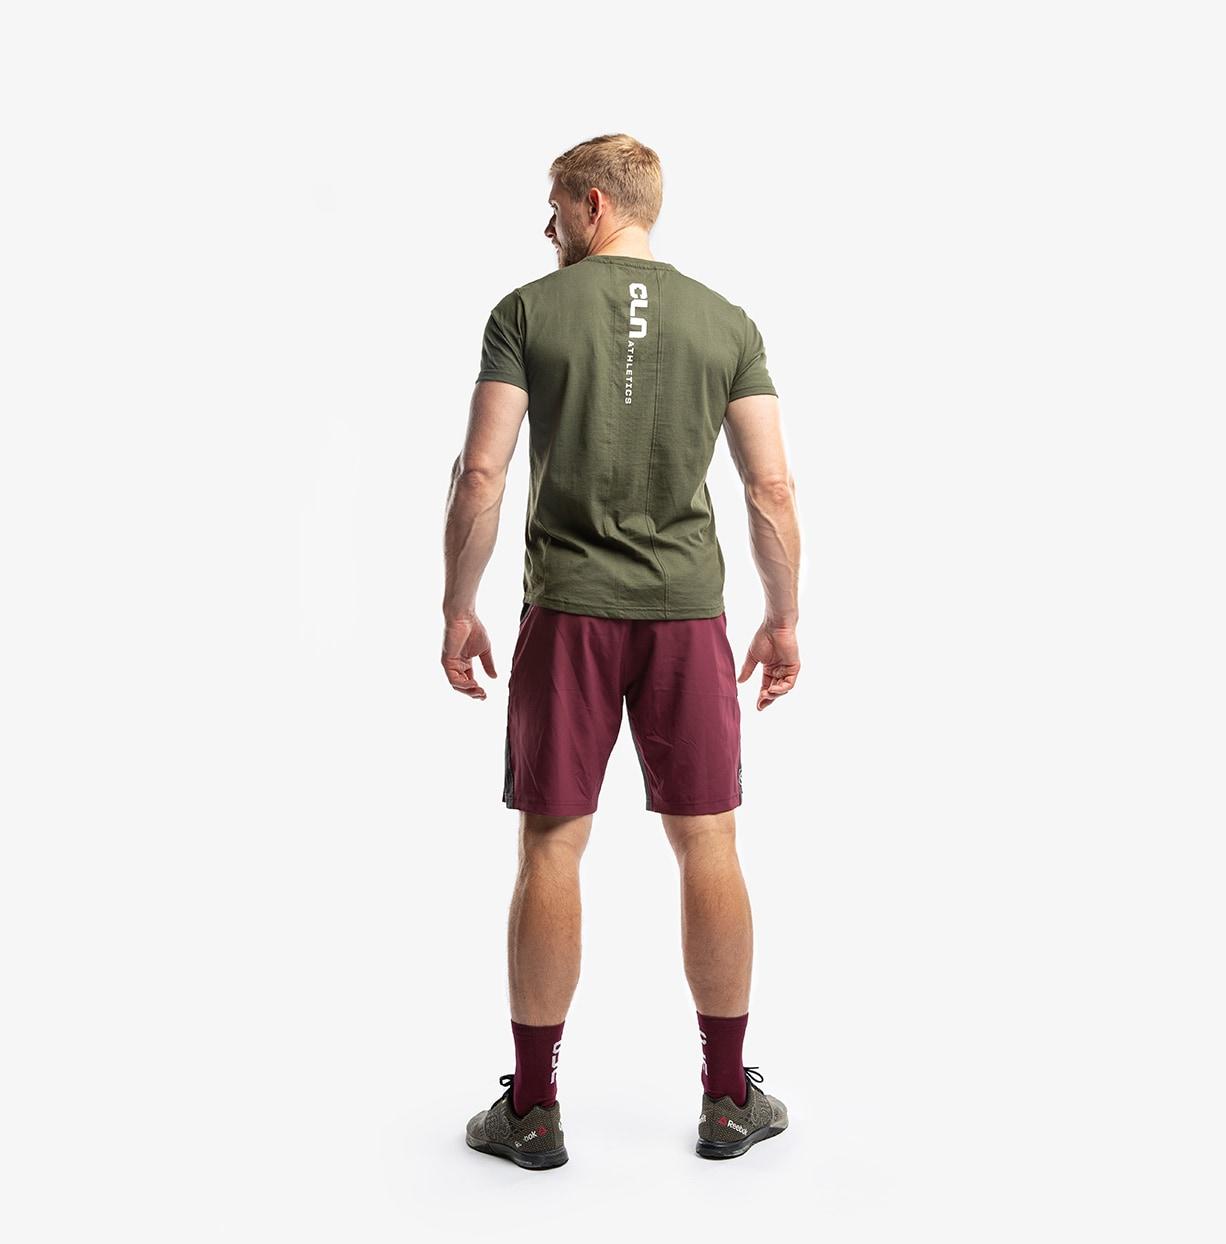 CLN Cruel T-Shirt Army